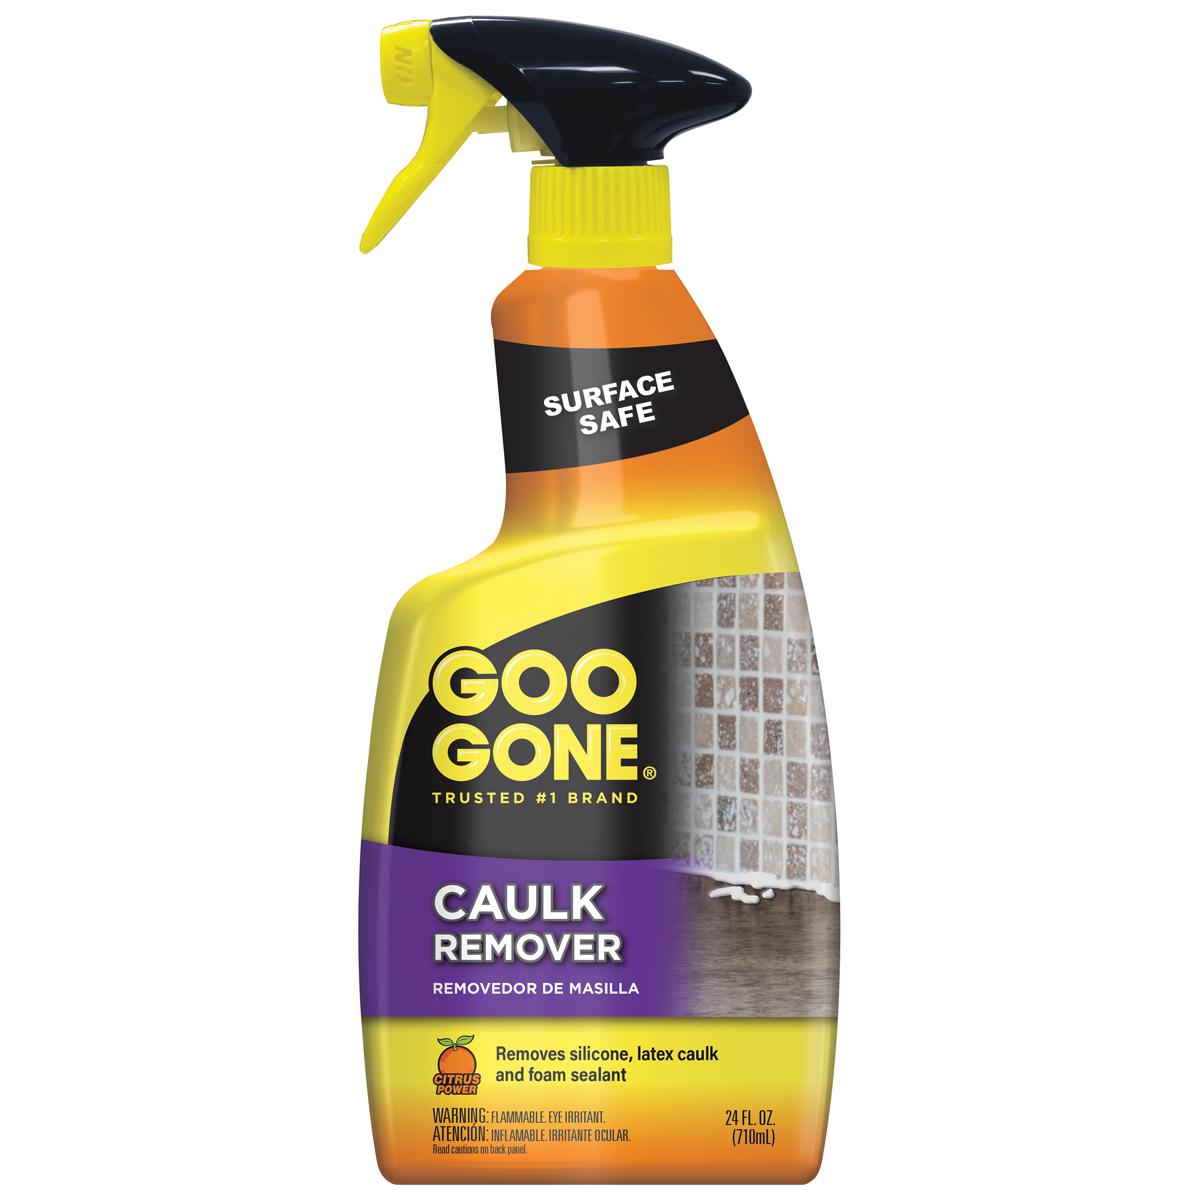 https://googone.com/media/catalog/product/g/o/goo-gone-caulk-remover_front_1.png